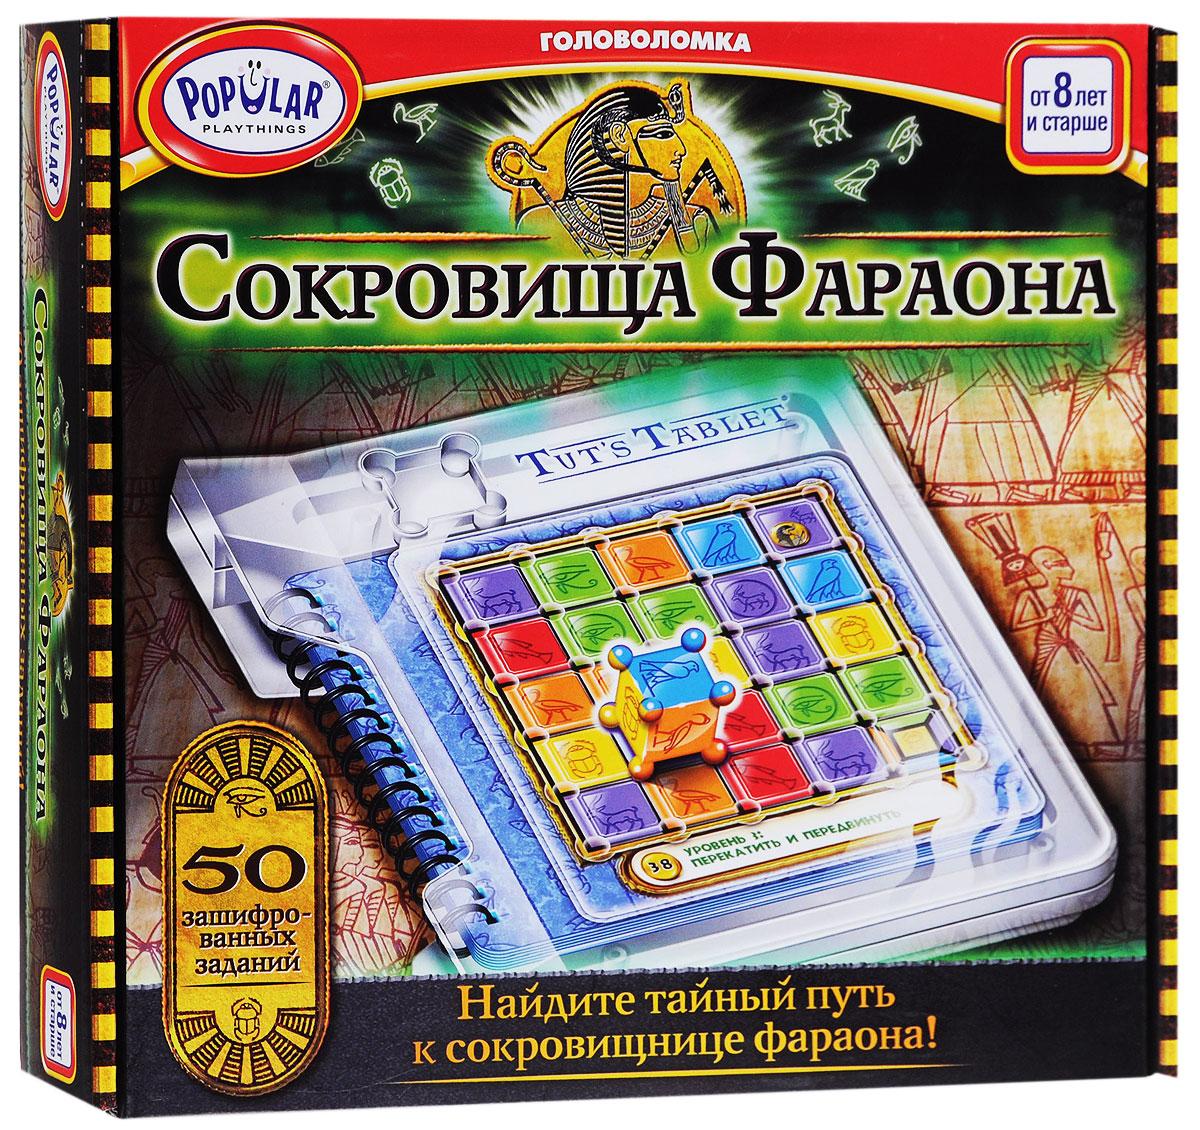 Popular Playthings Настольная игра Сокровища Фараона